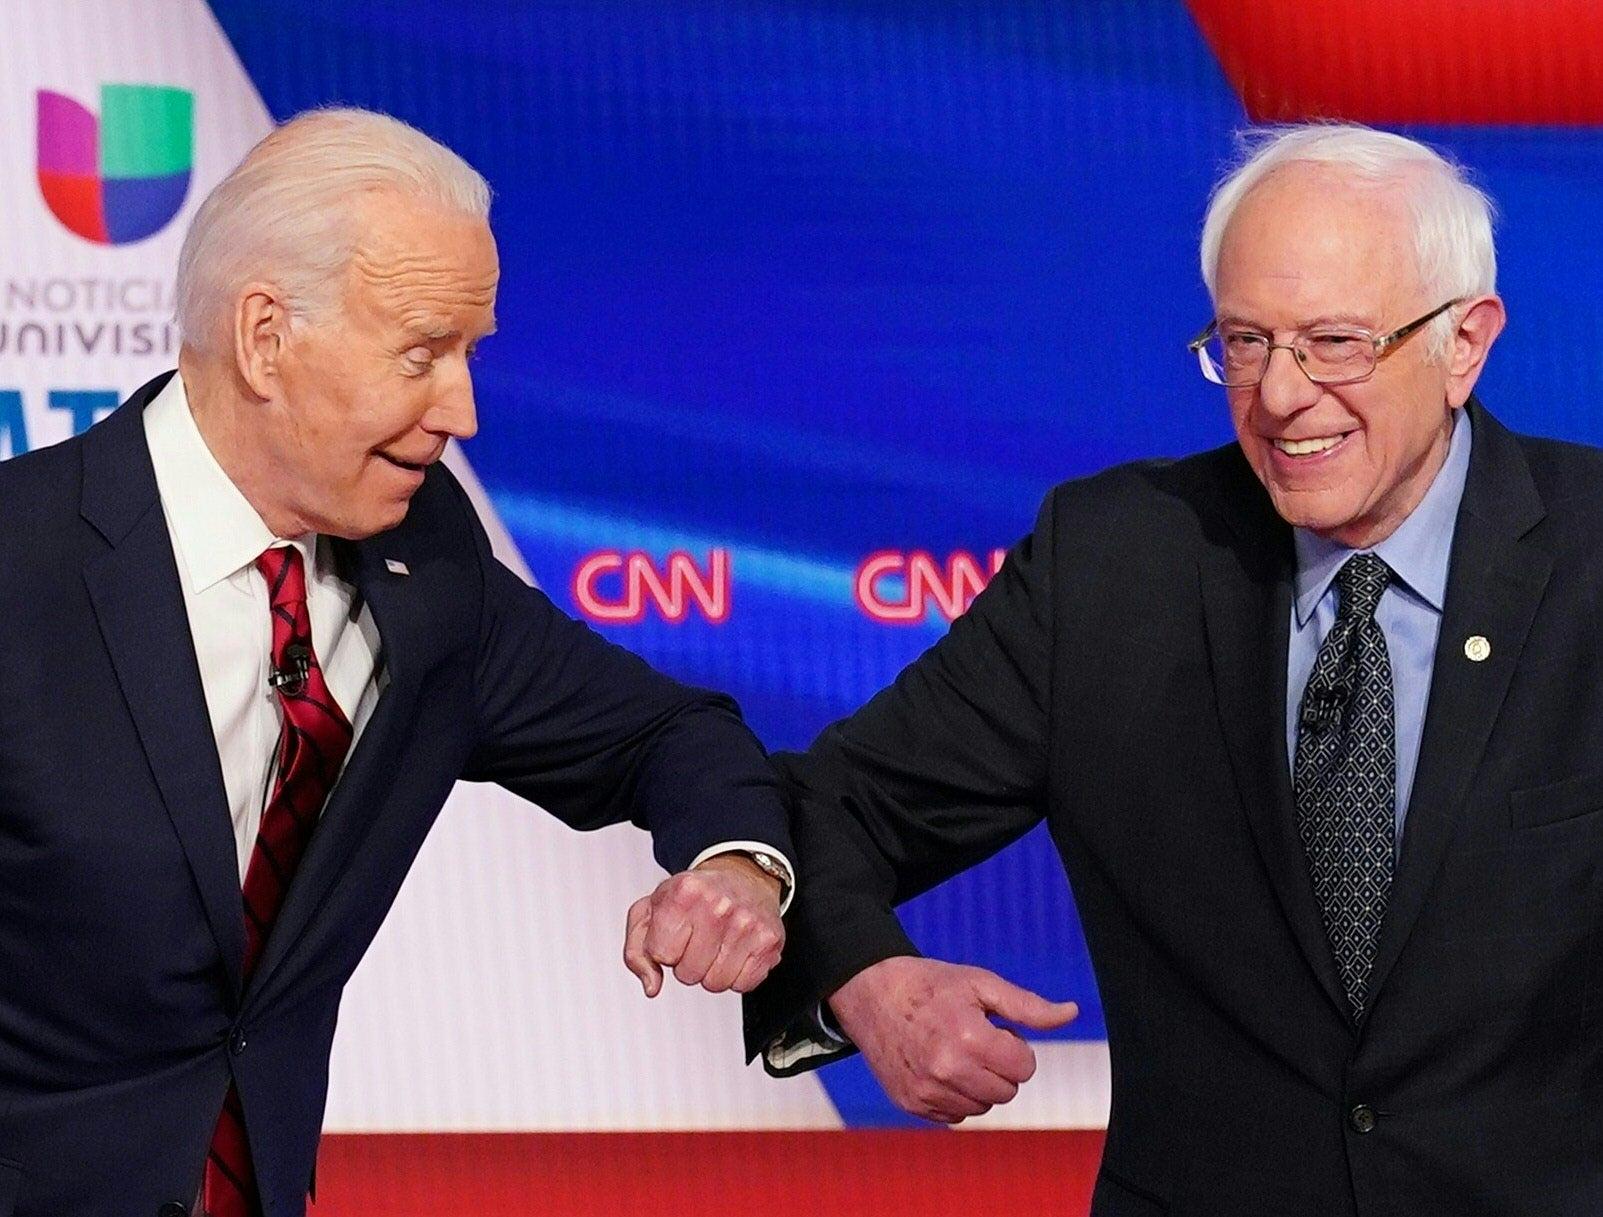 Bernie Sanders endorses Joe Biden in US election thumbnail